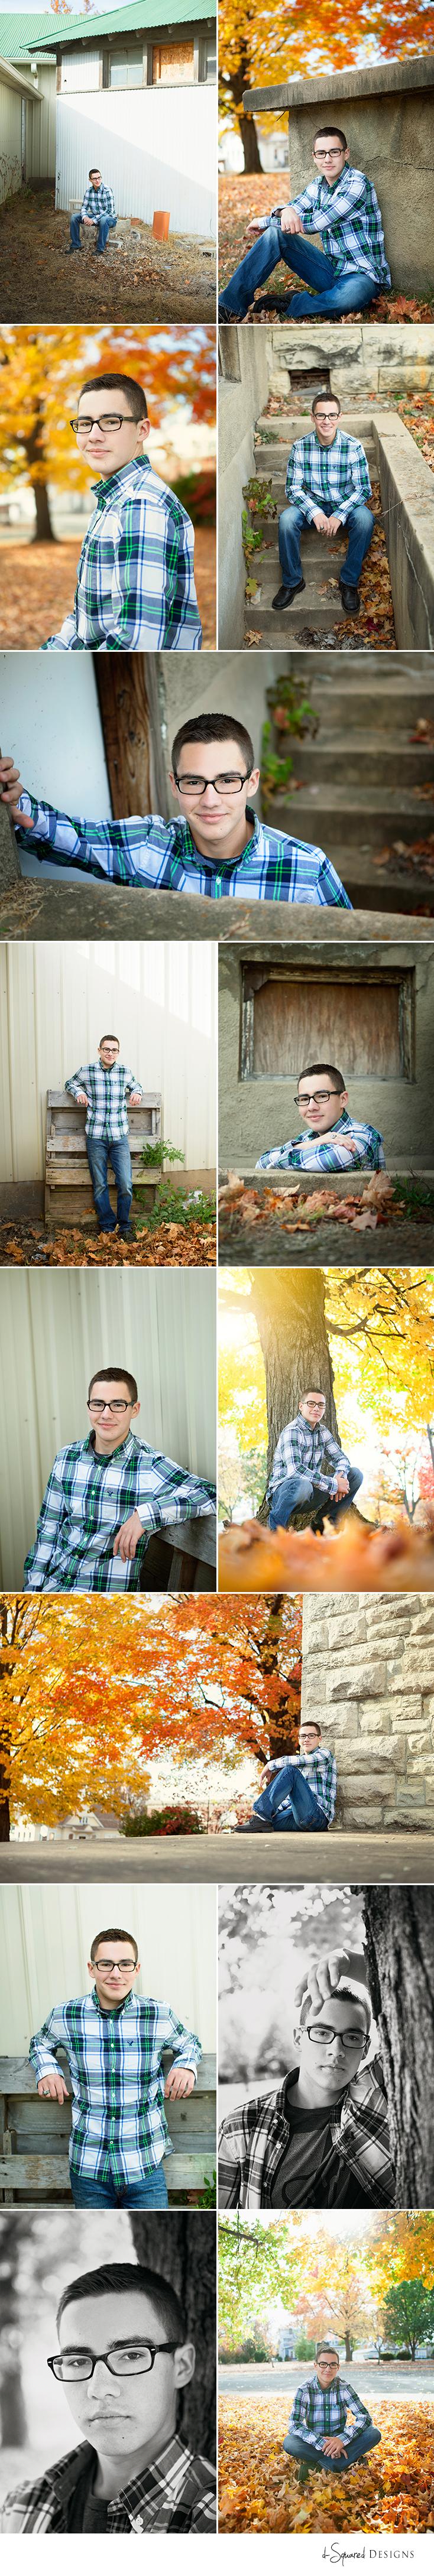 d-Squared Designs St. Louis, MO Senior Photography. Senior fall guy. Senior photography. Fall senior session.